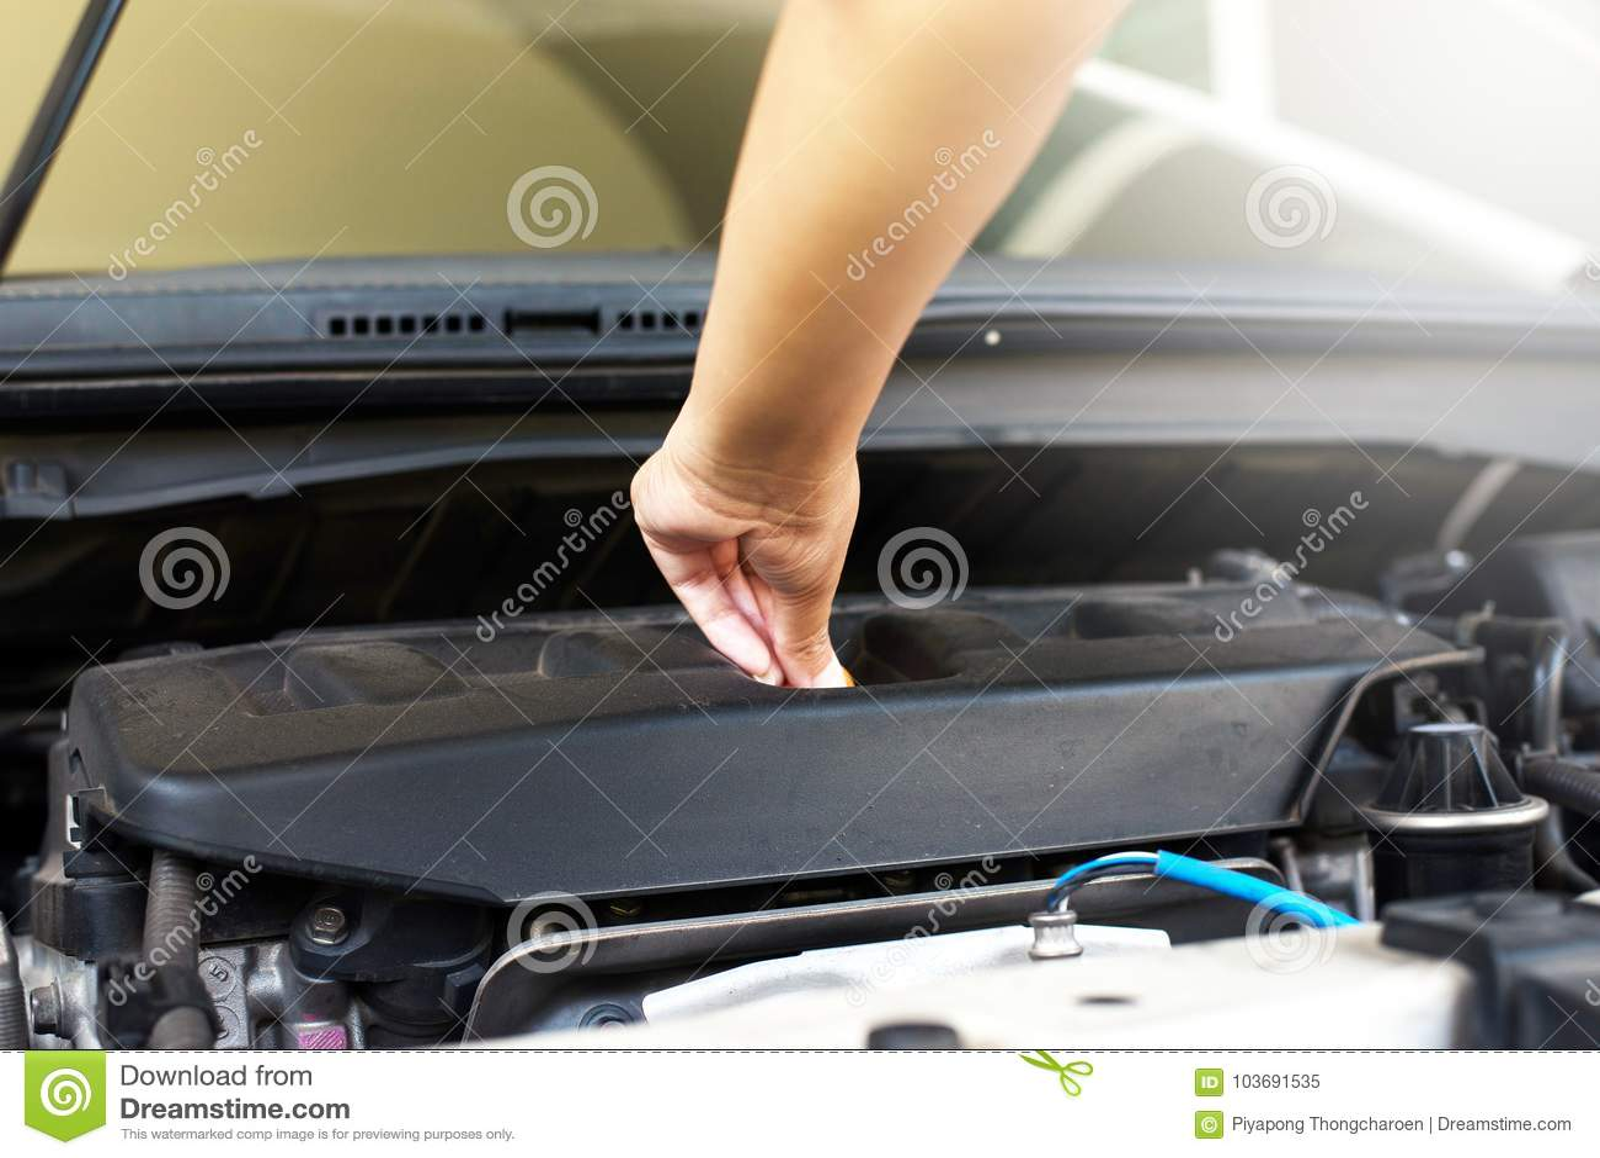 Mechanic changing oil mechanic car